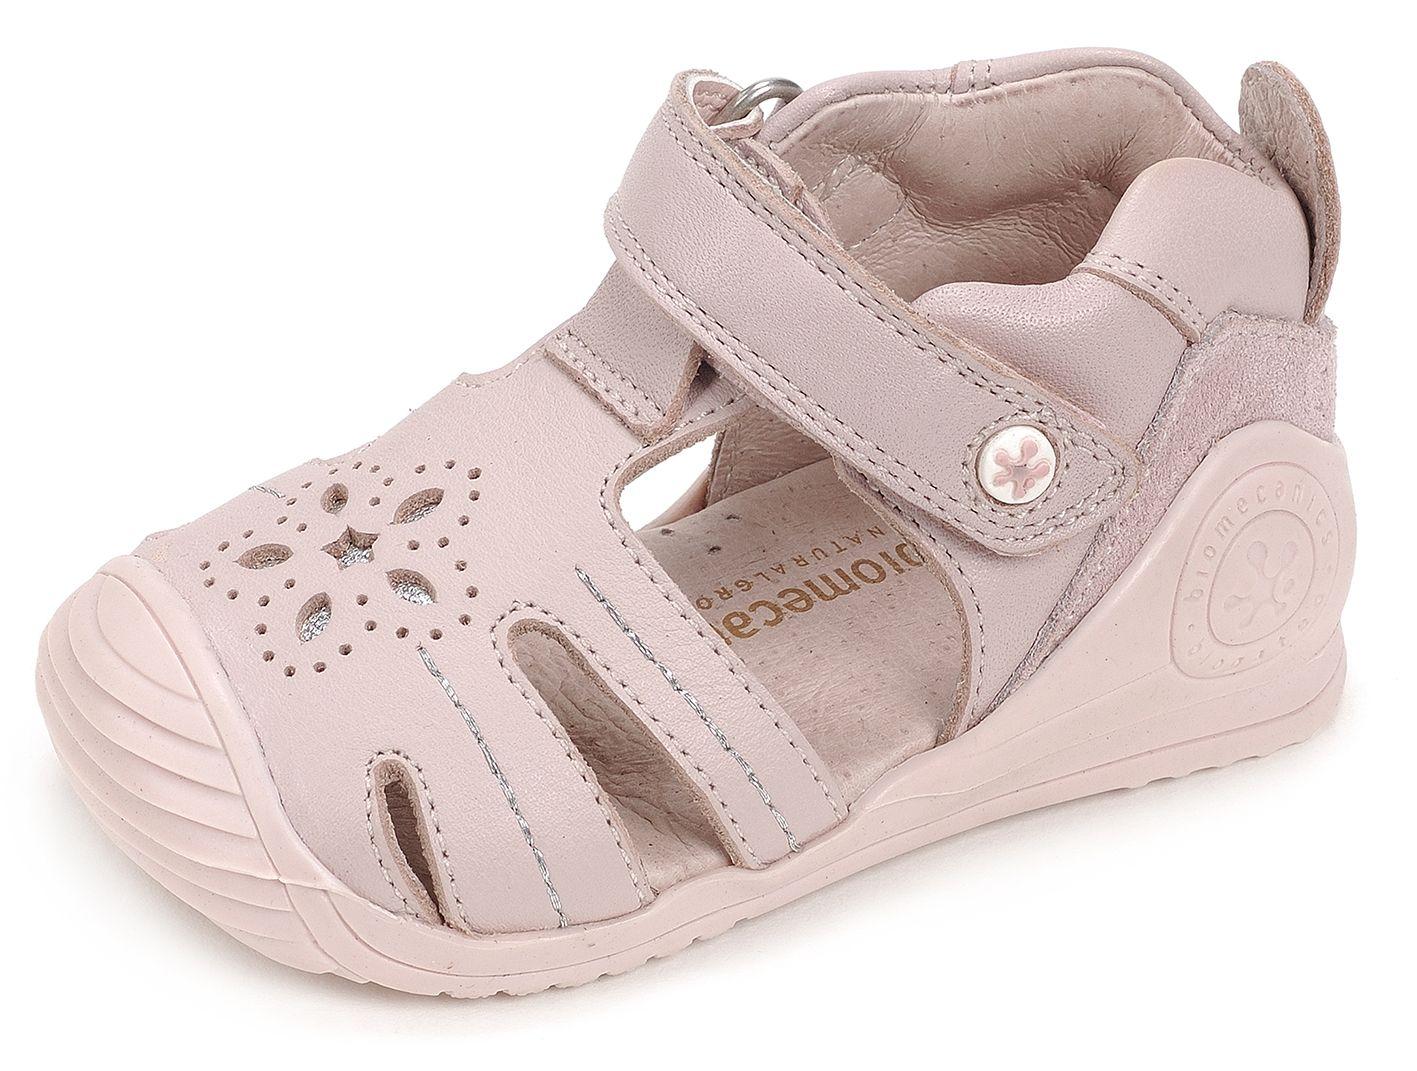 diseñador de moda 9603f 39929 Sandalia Biomecanics niña - Rosa - 172131 | BABY'S | Ropas ...